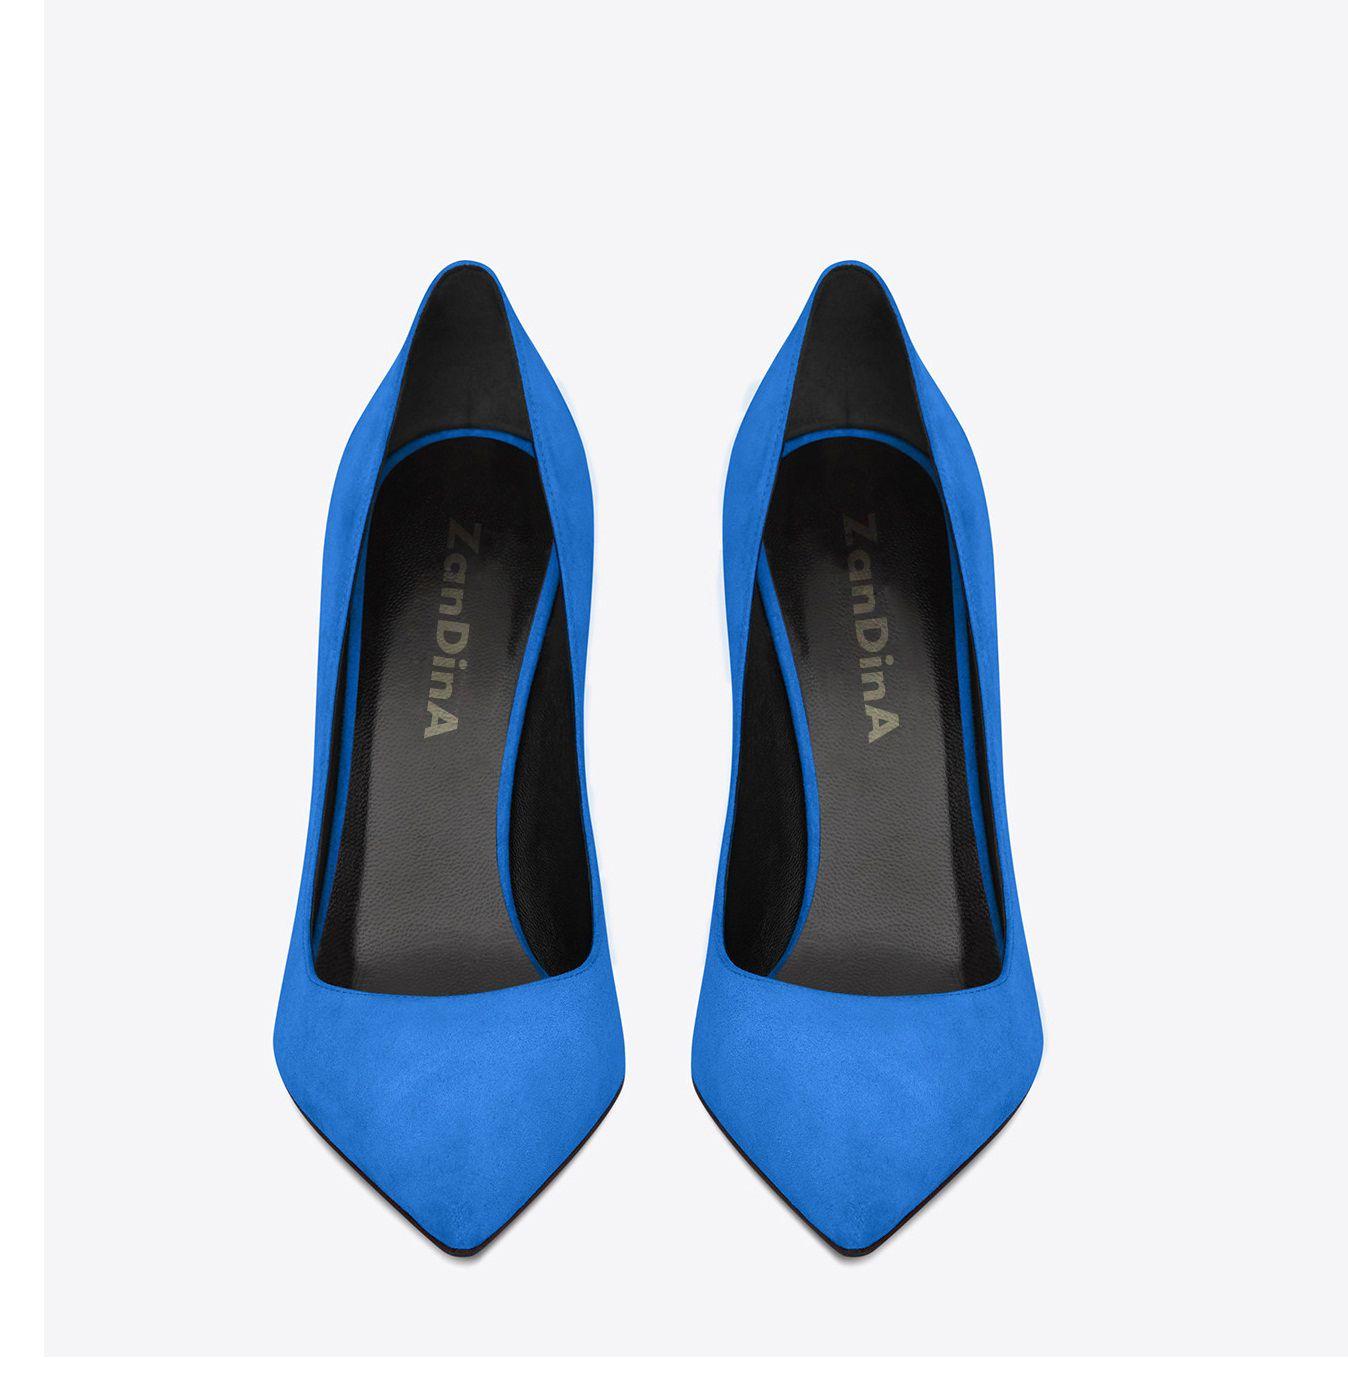 Zandina Womens Fashion Handmade Classic Pairs 100mm High Heel Escarpin Pumps Slip-on Pointed Toe Office Party Shoes Blue Z626293